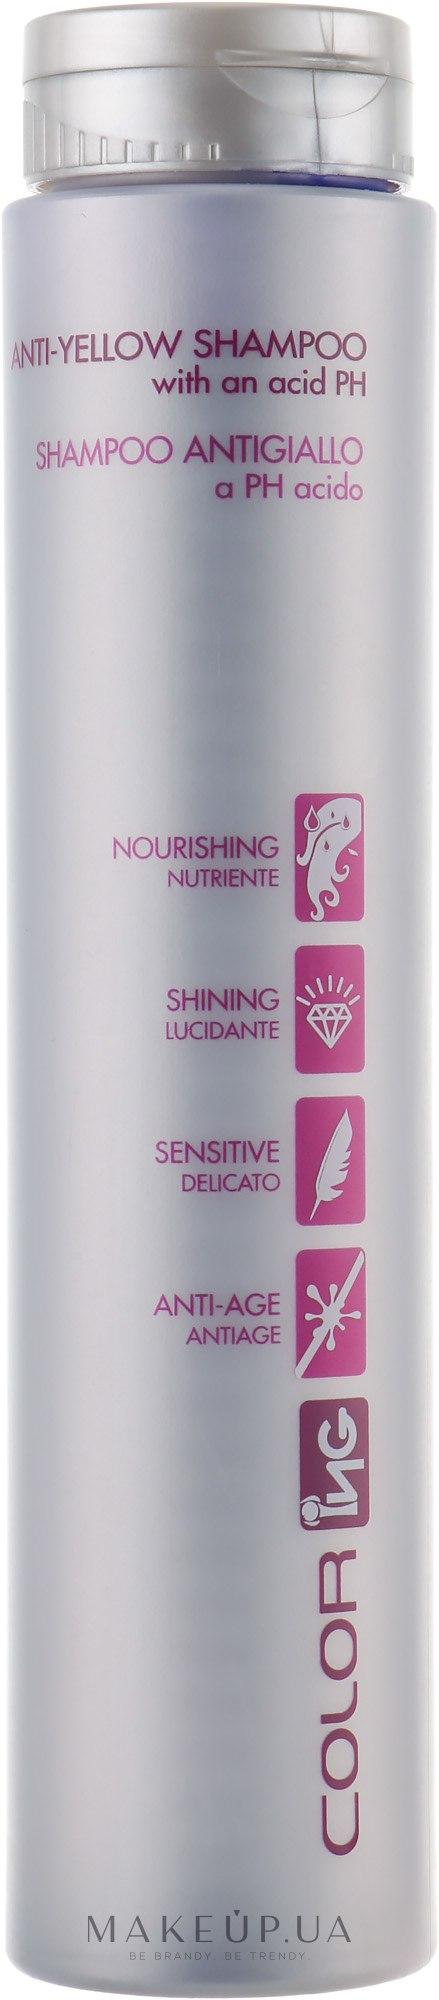 Антижовтий шампунь - ING Professional Color-ING Anti Yellow Shampoo — фото 250ml